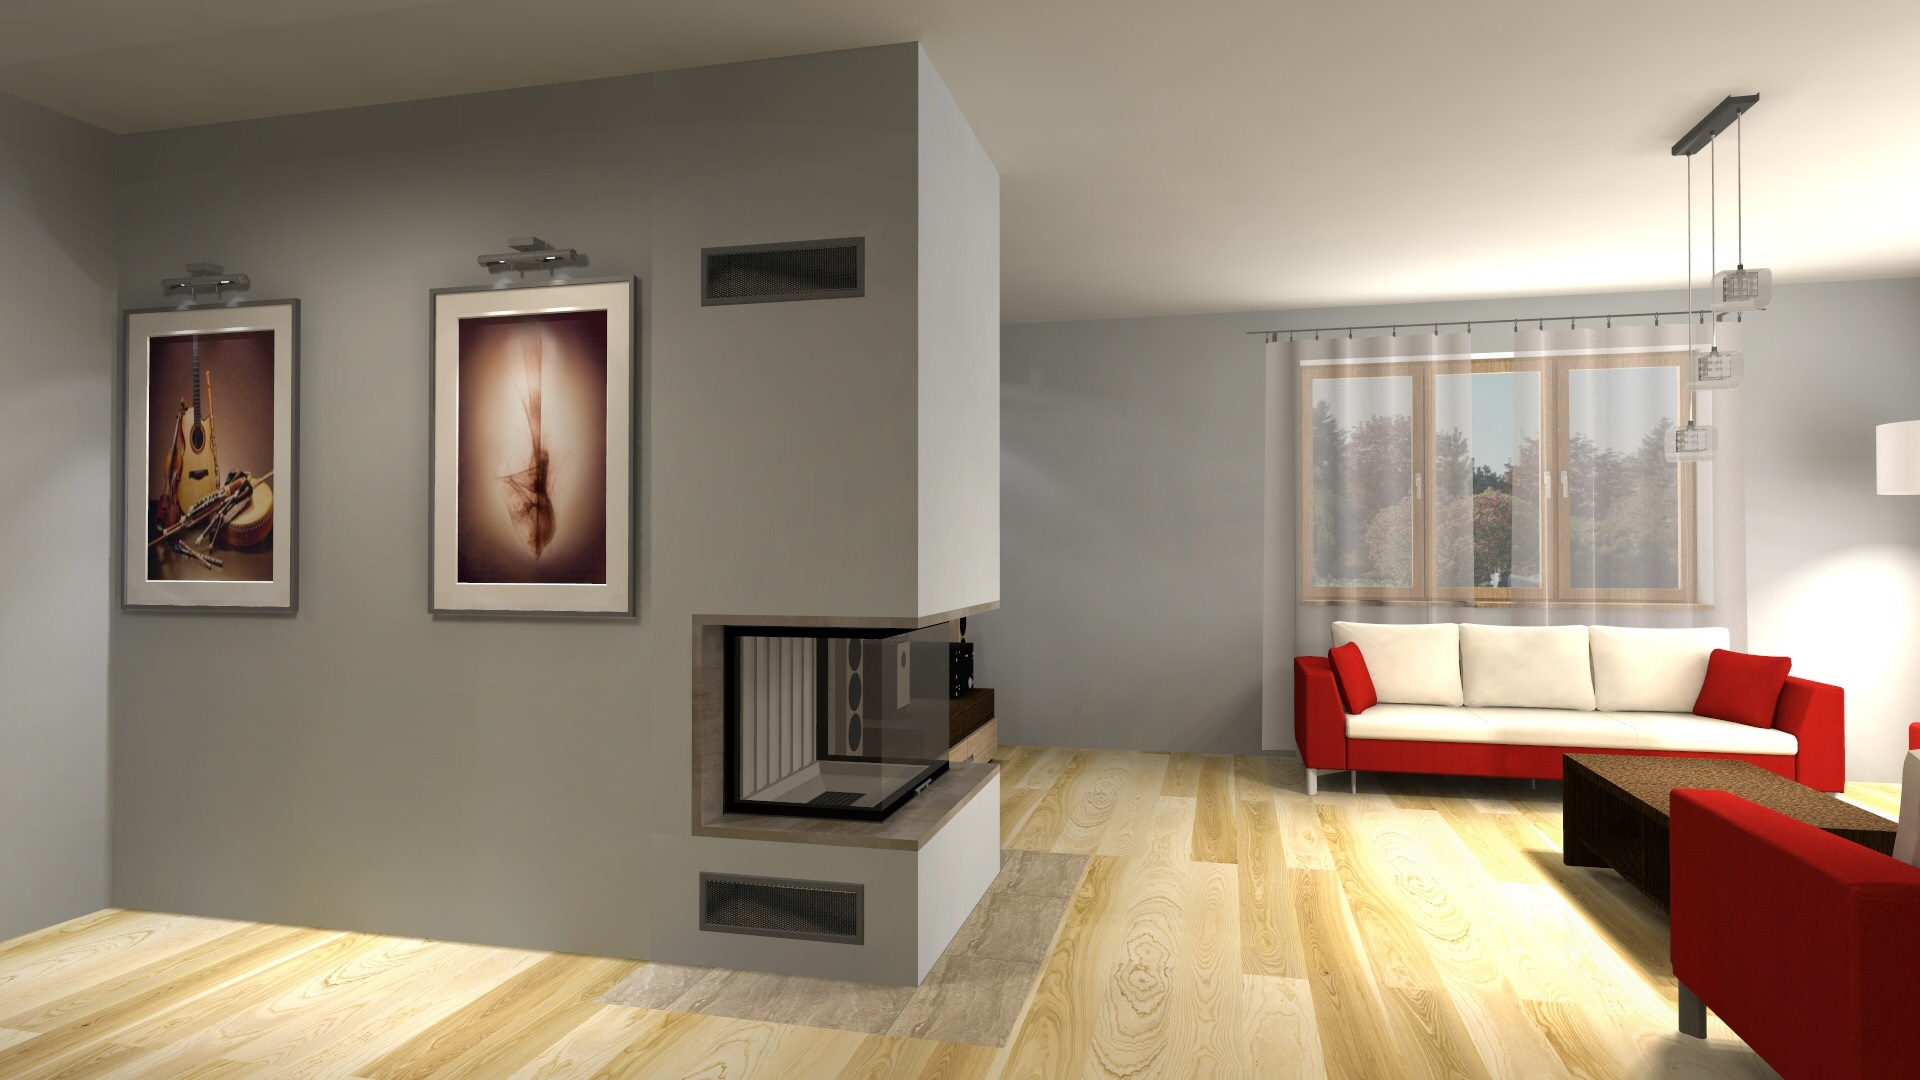 dreiseitiger moderner kamin zp20 mit montage. Black Bedroom Furniture Sets. Home Design Ideas